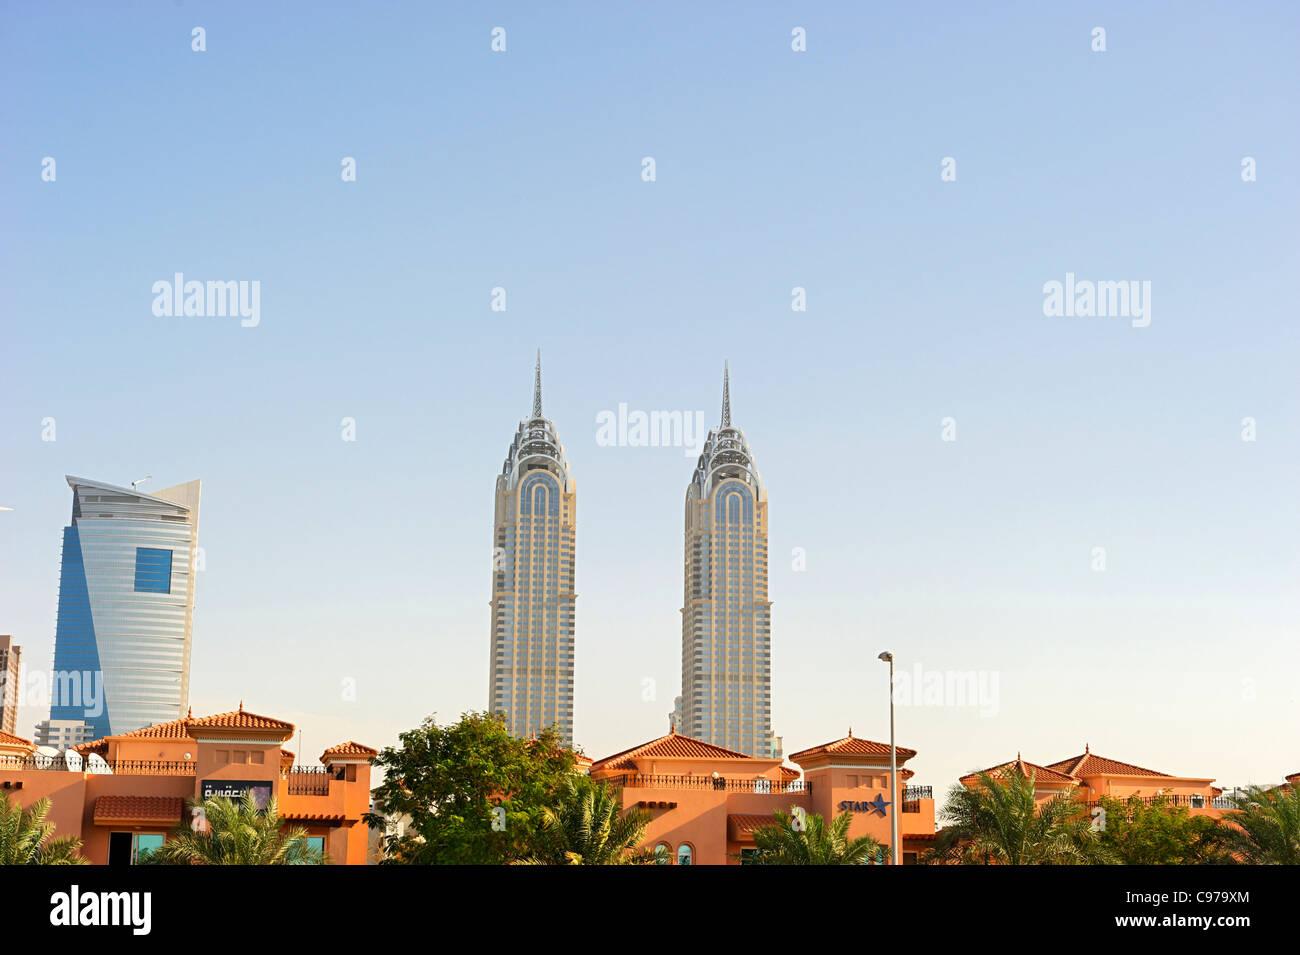 High-rise buildings, downtown Dubai, Dubai, United Arab Emirates, Middle East - Stock Image